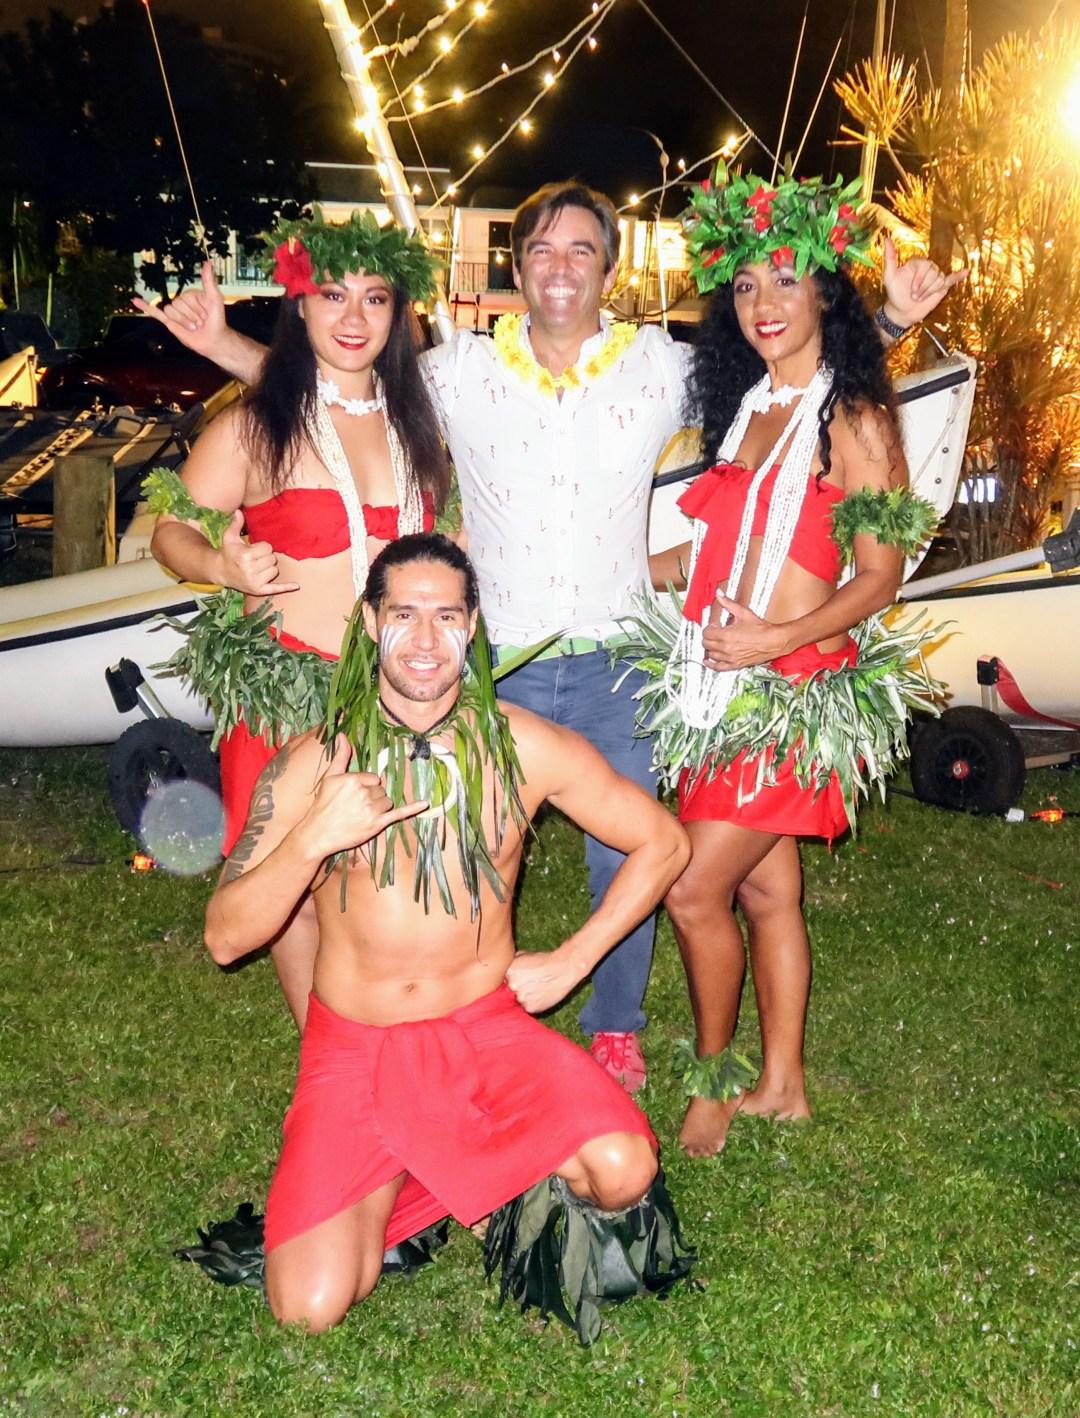 Chris Callahan with the Island Dancers - Photo by Aaron Wormus